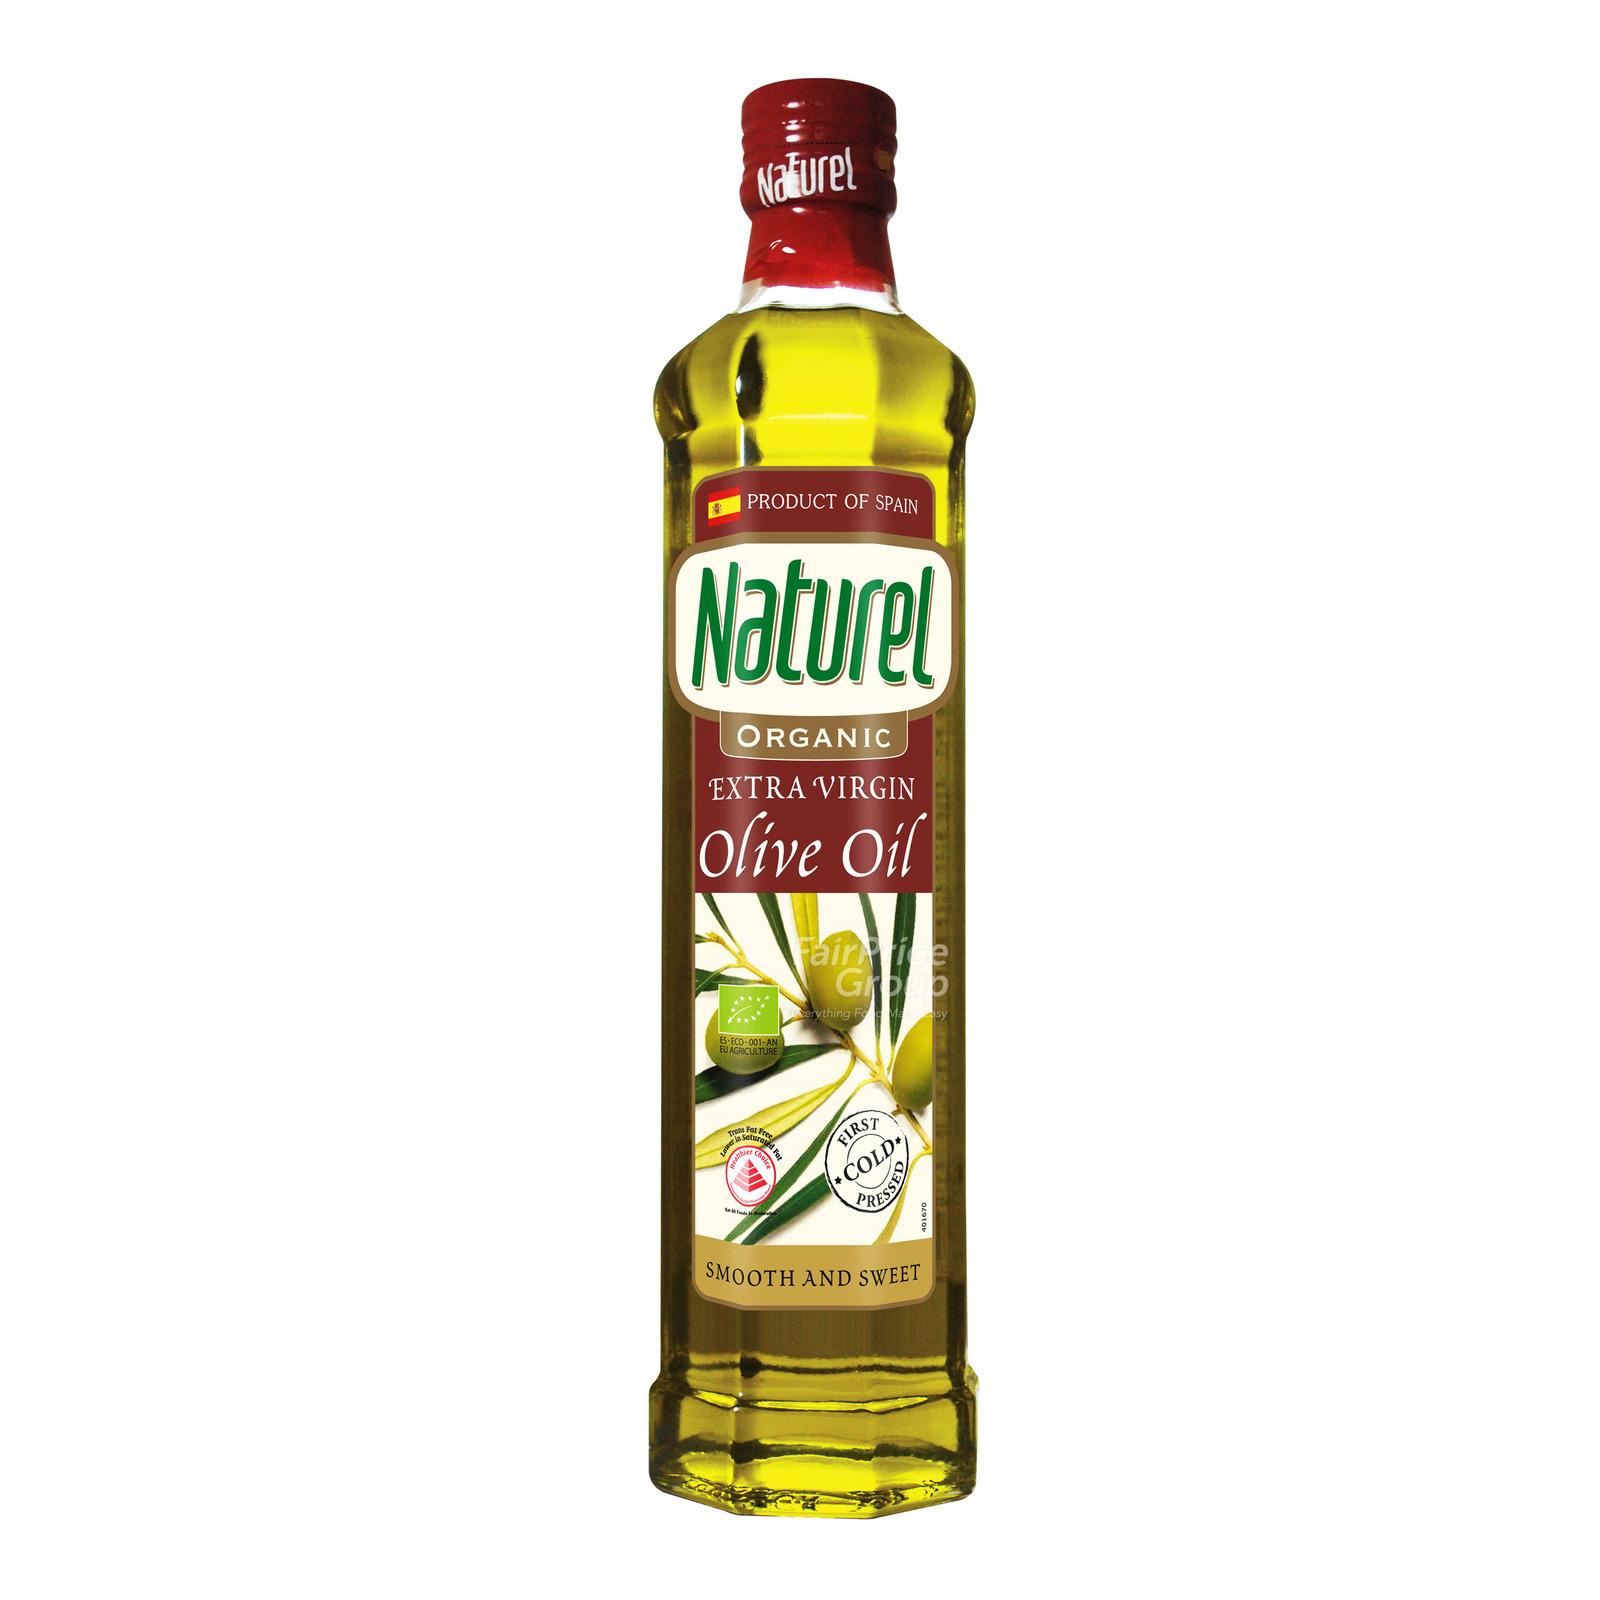 Naturel Organic Olive Oil - Extra Virgin